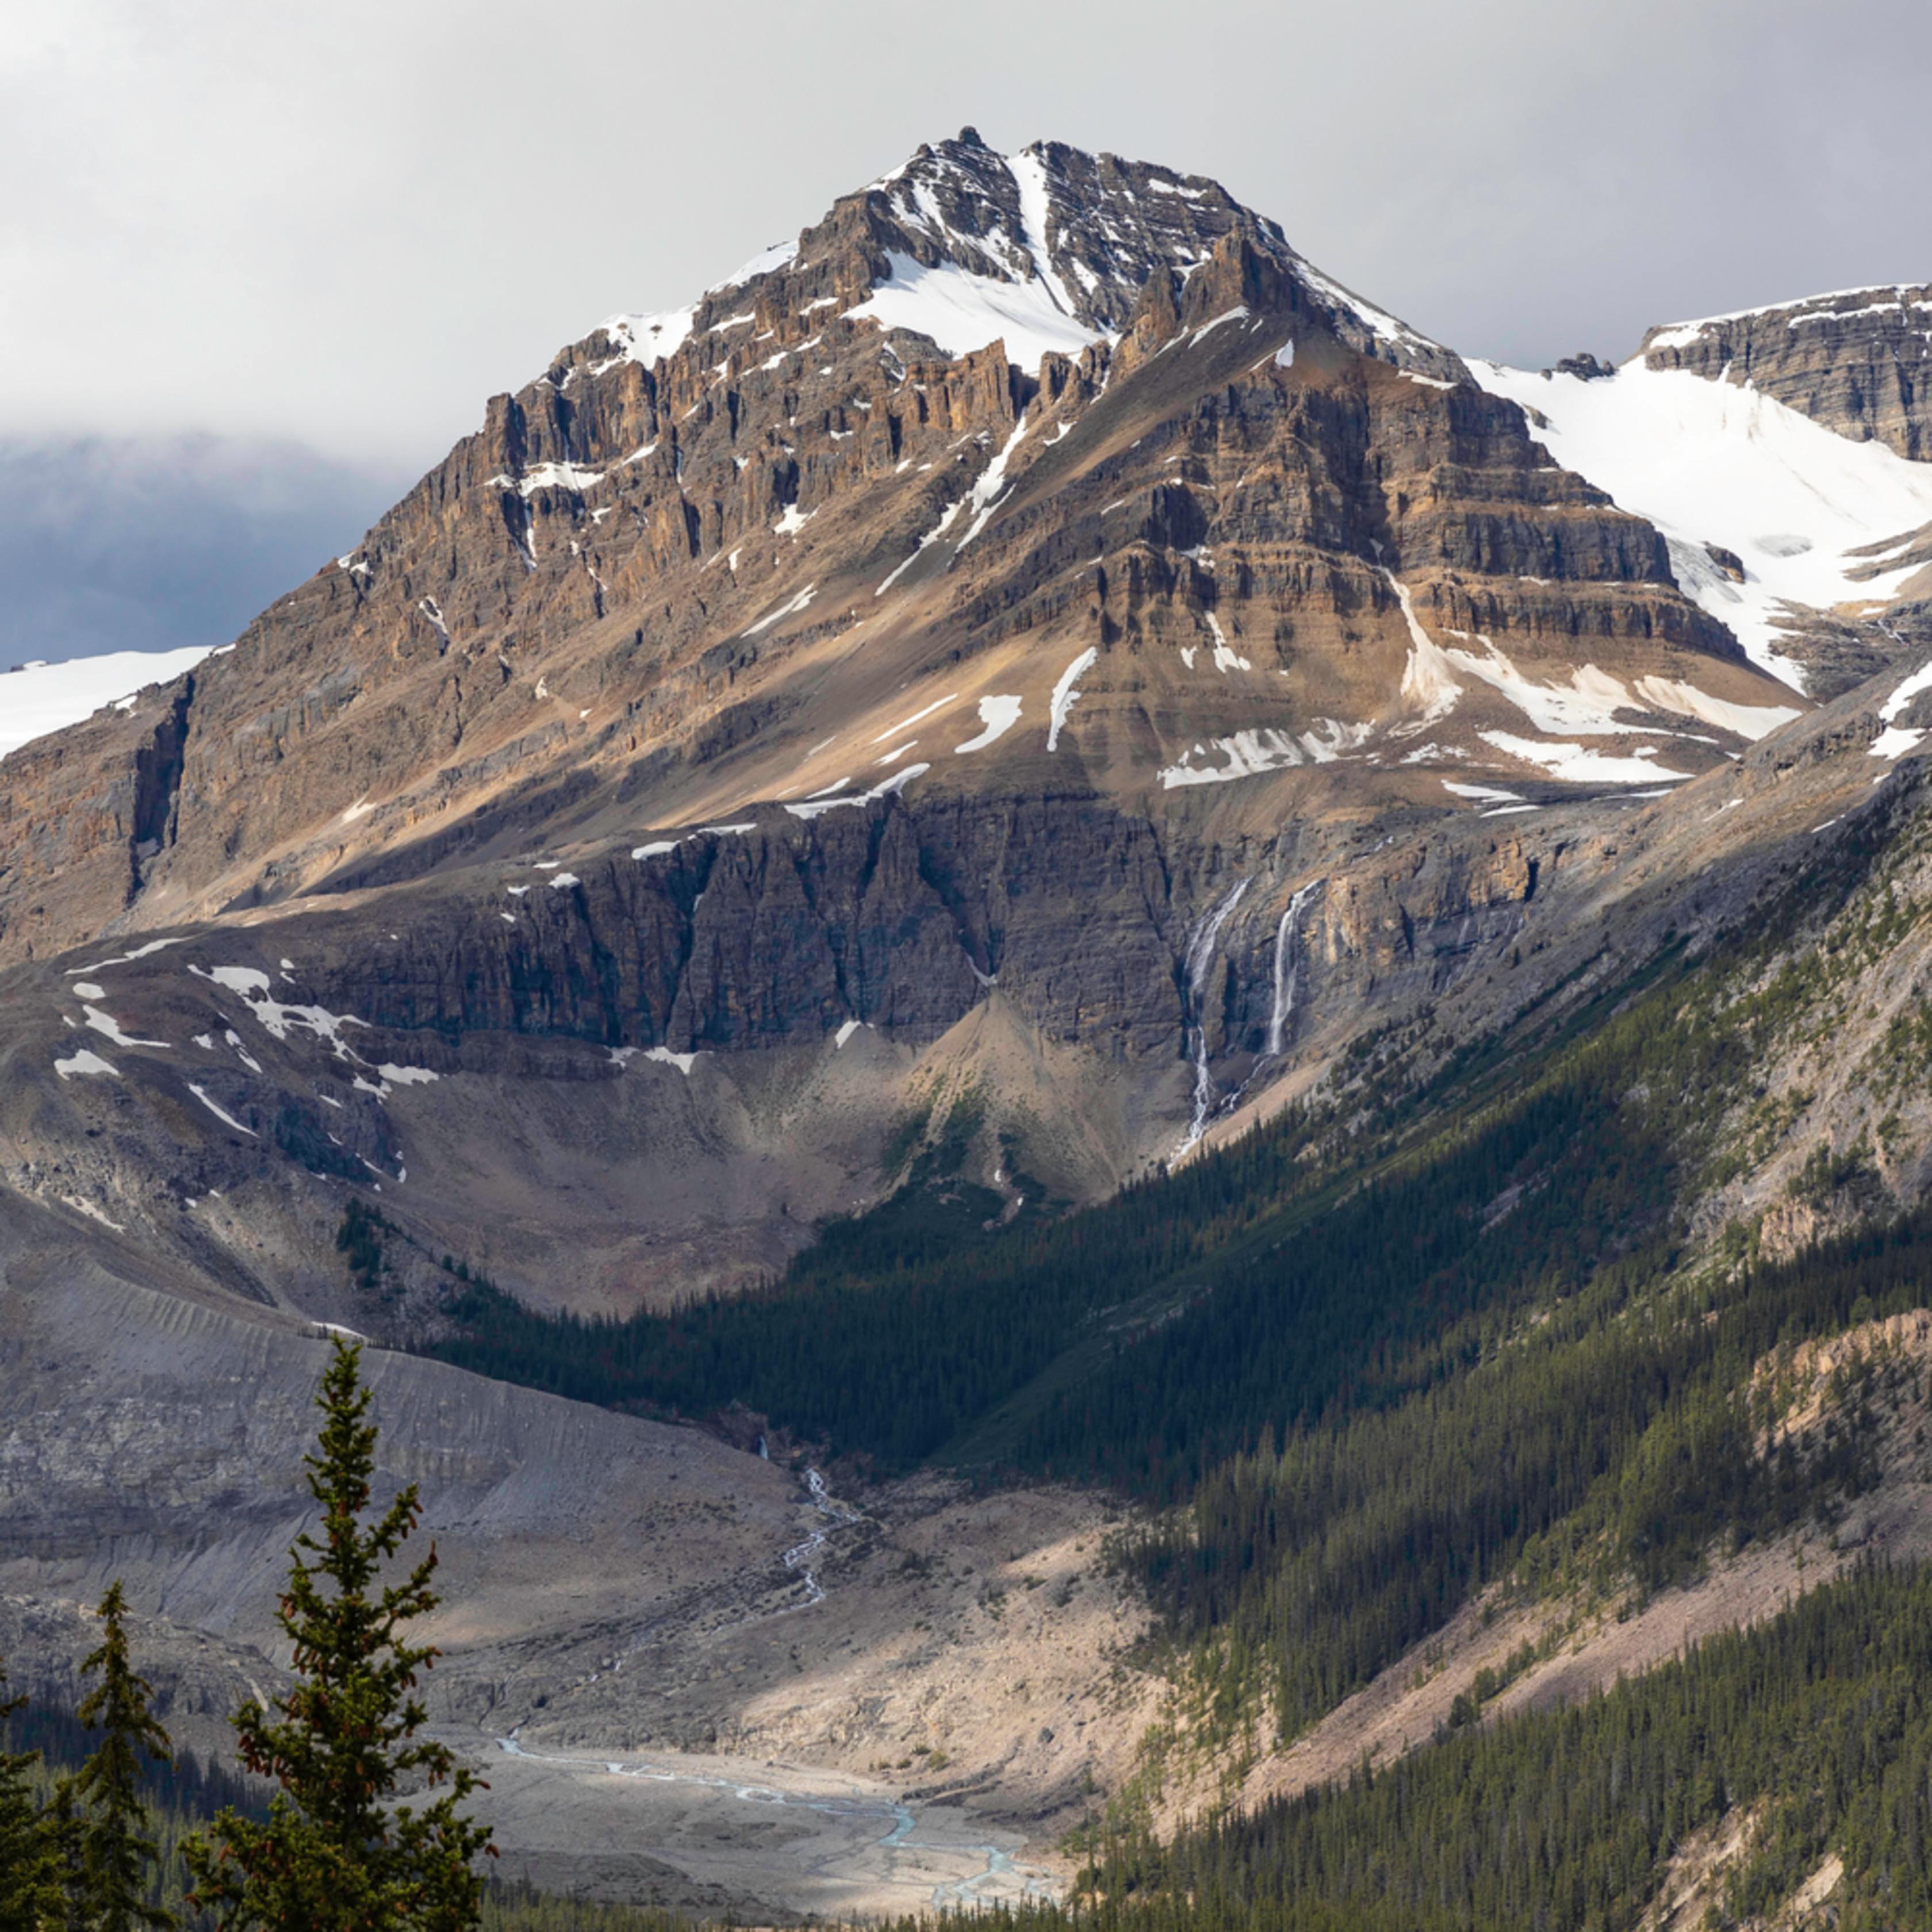 Peyto glacier svpbzb